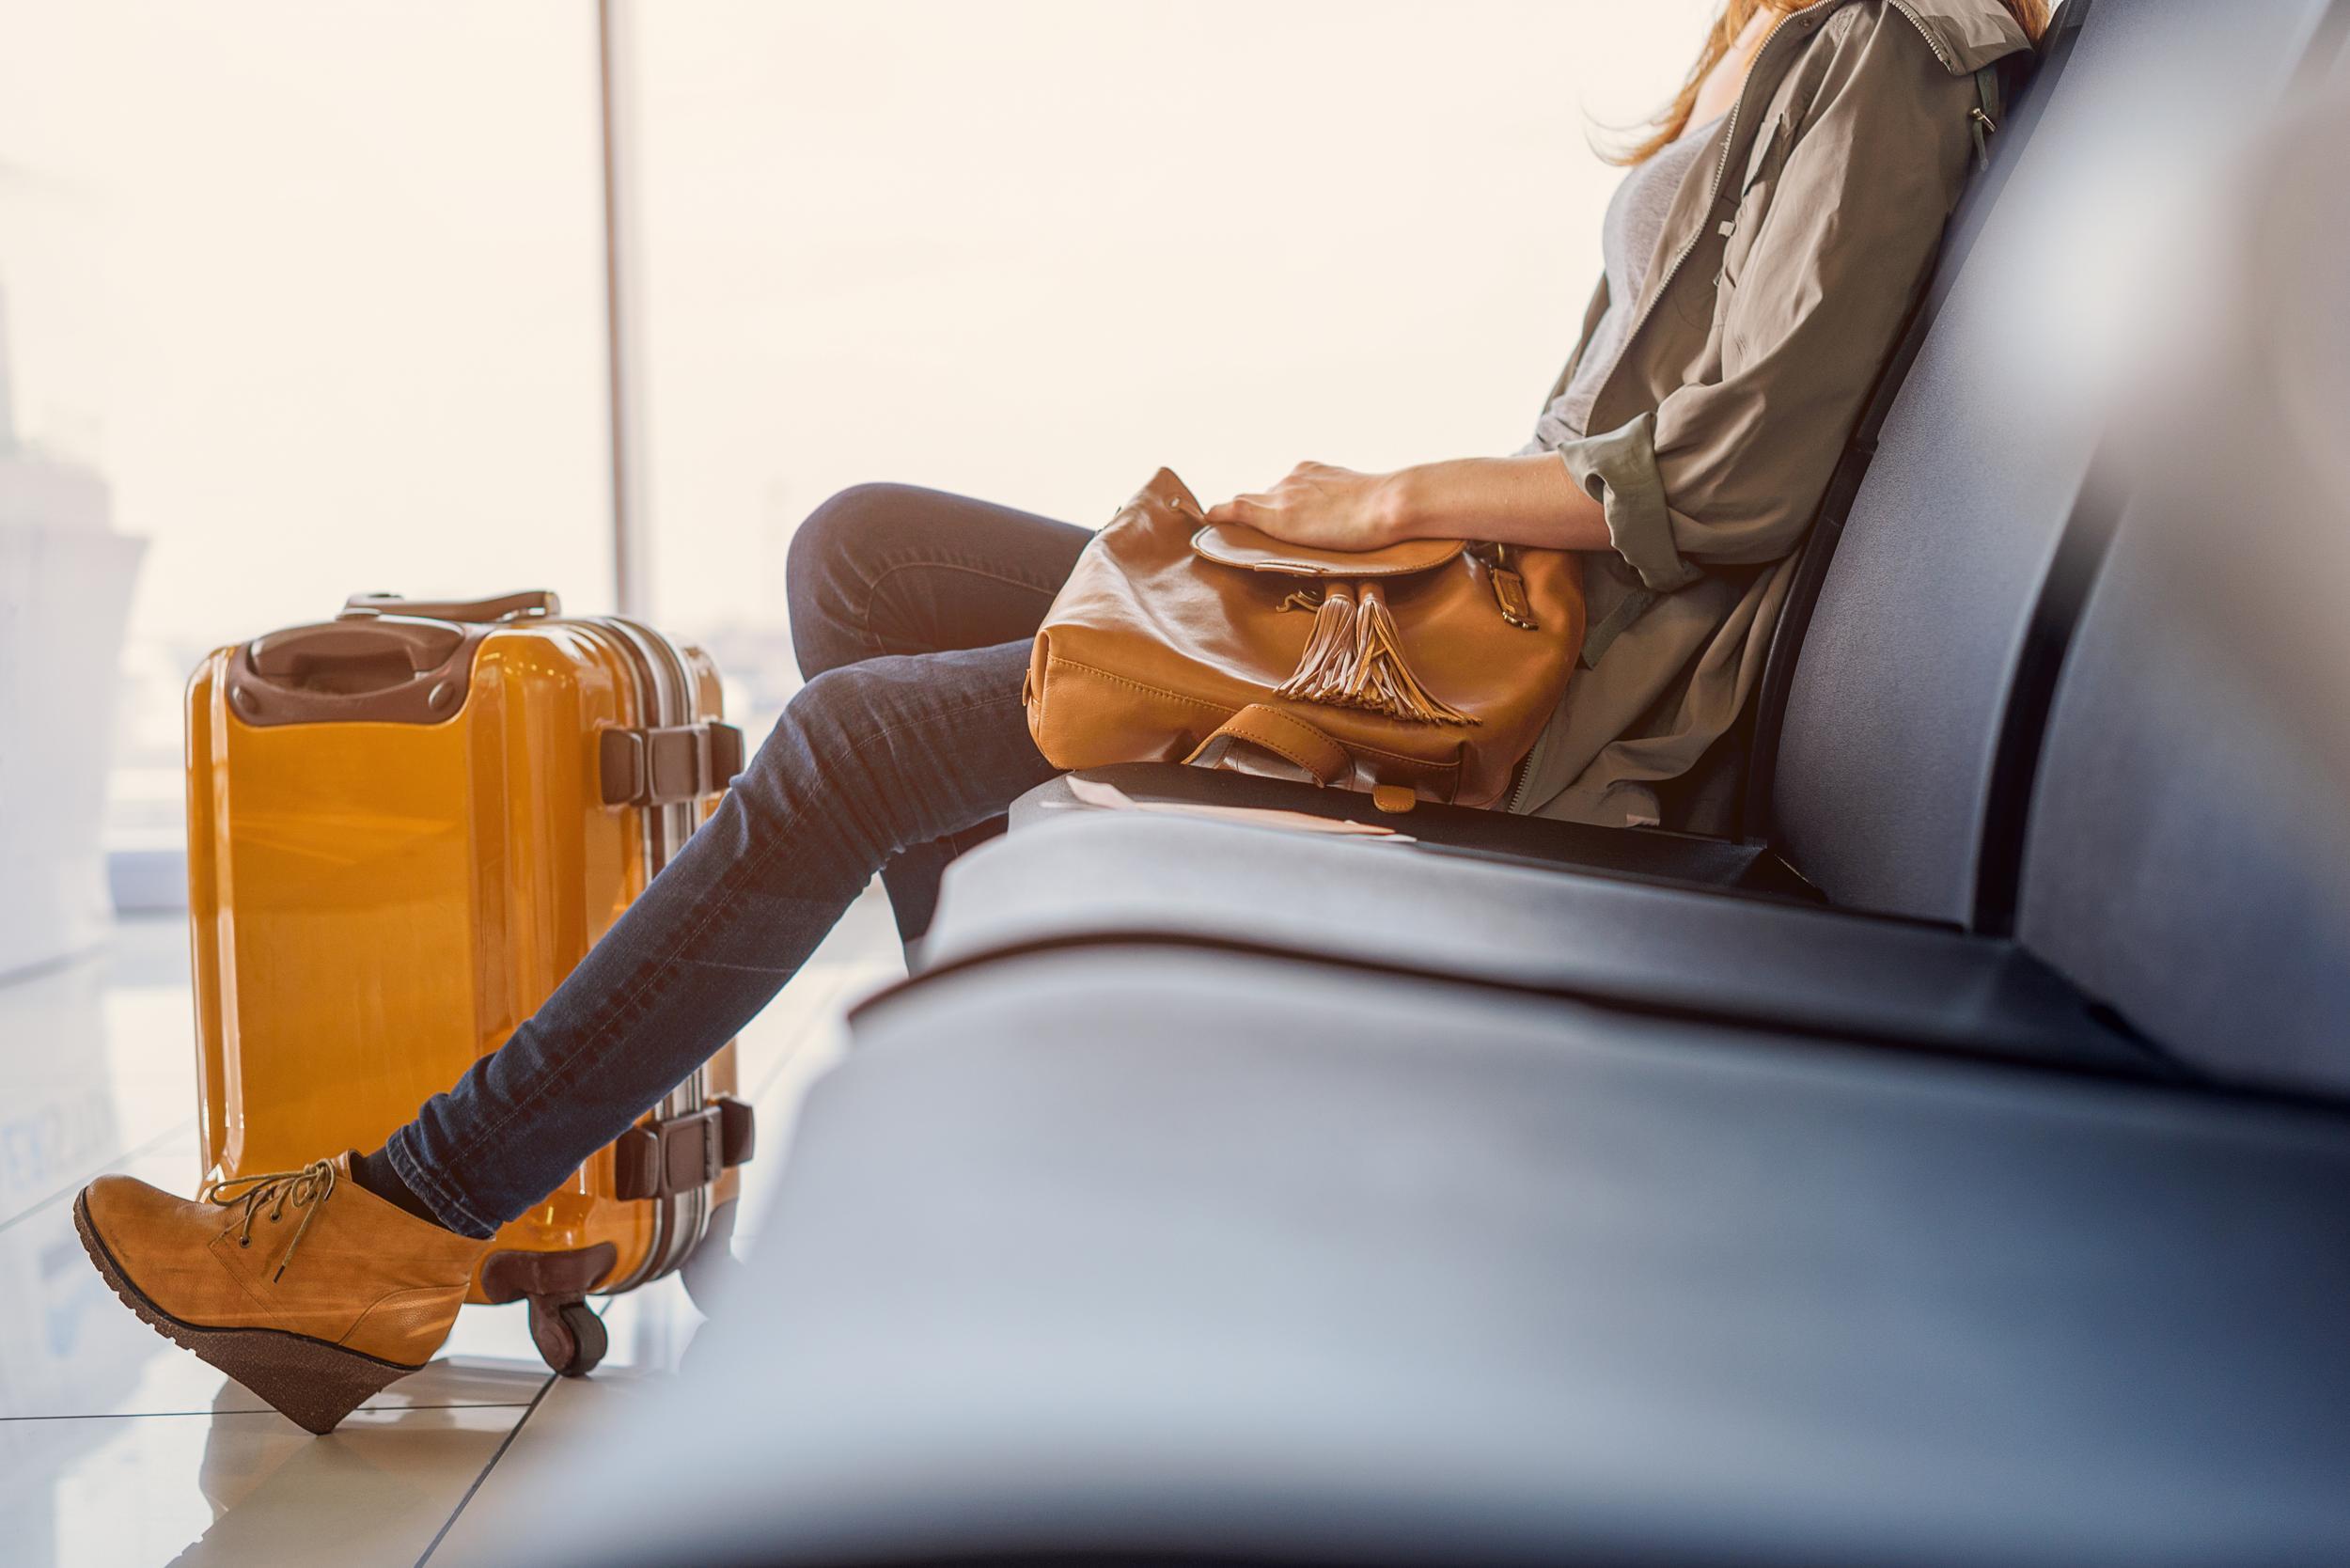 Smiling girl waiting for boarding